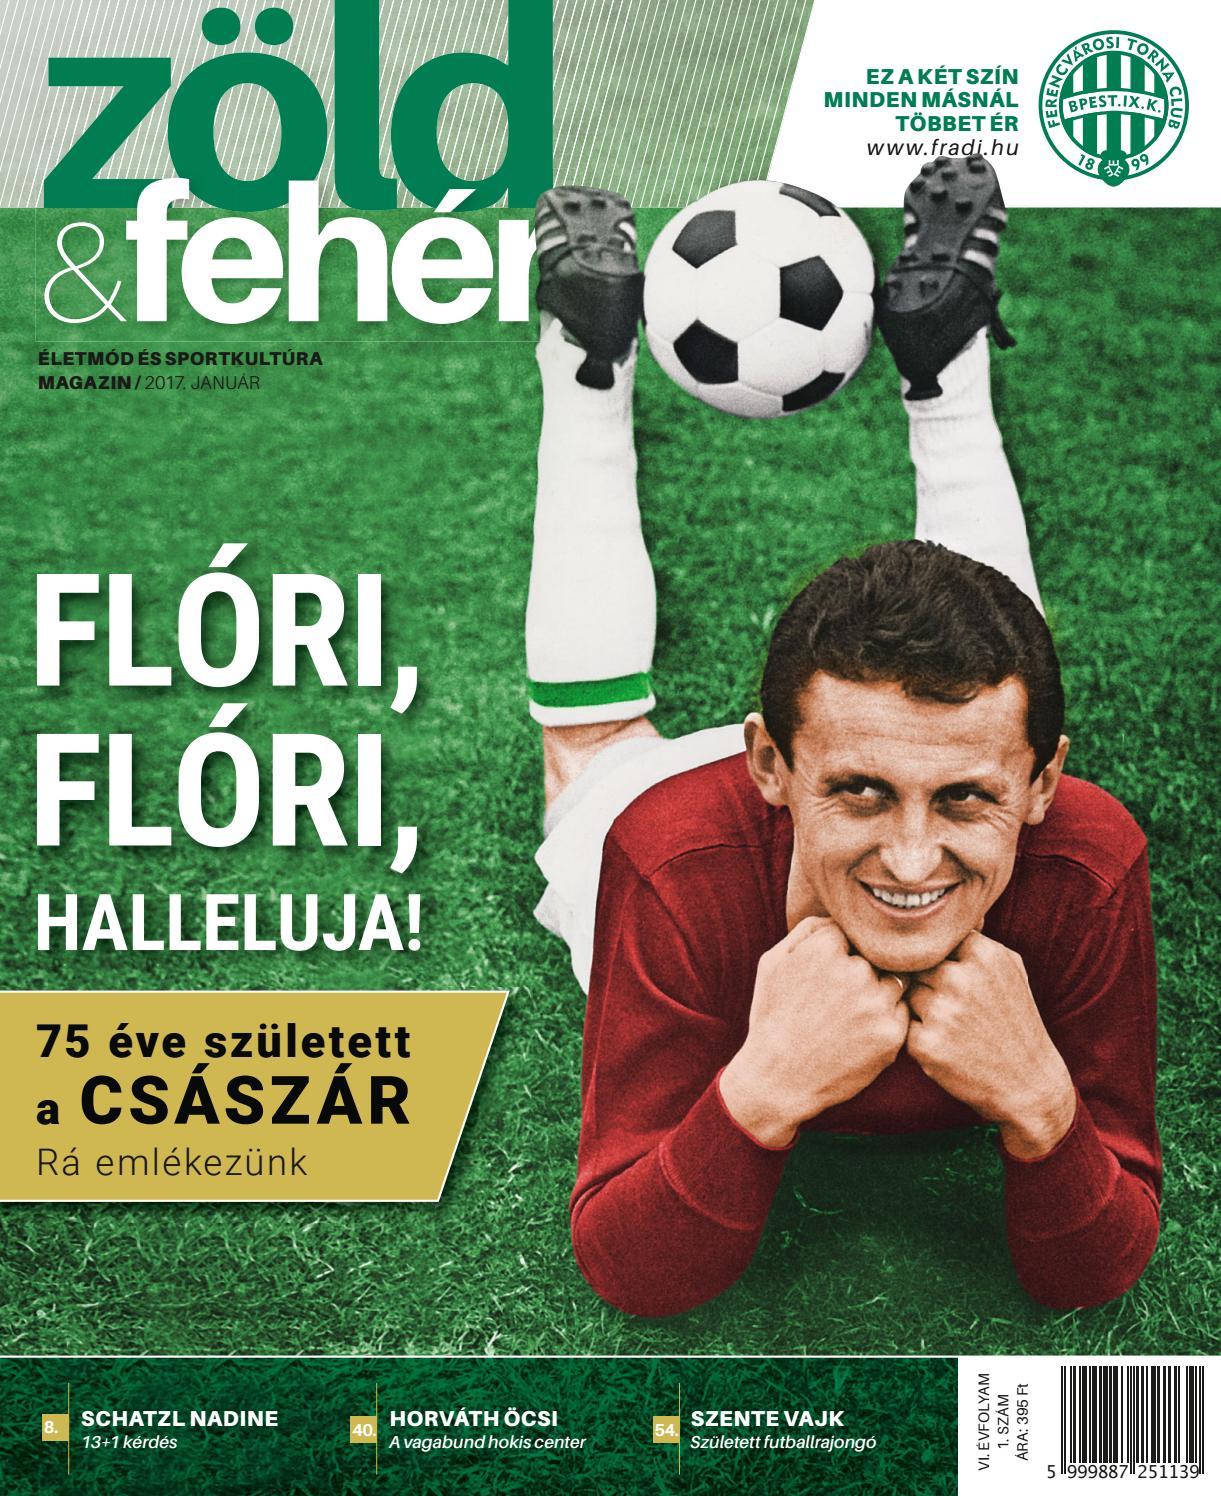 Zöld és fehér magazin - 17 01 by FradiMedia - issuu 2155810d62